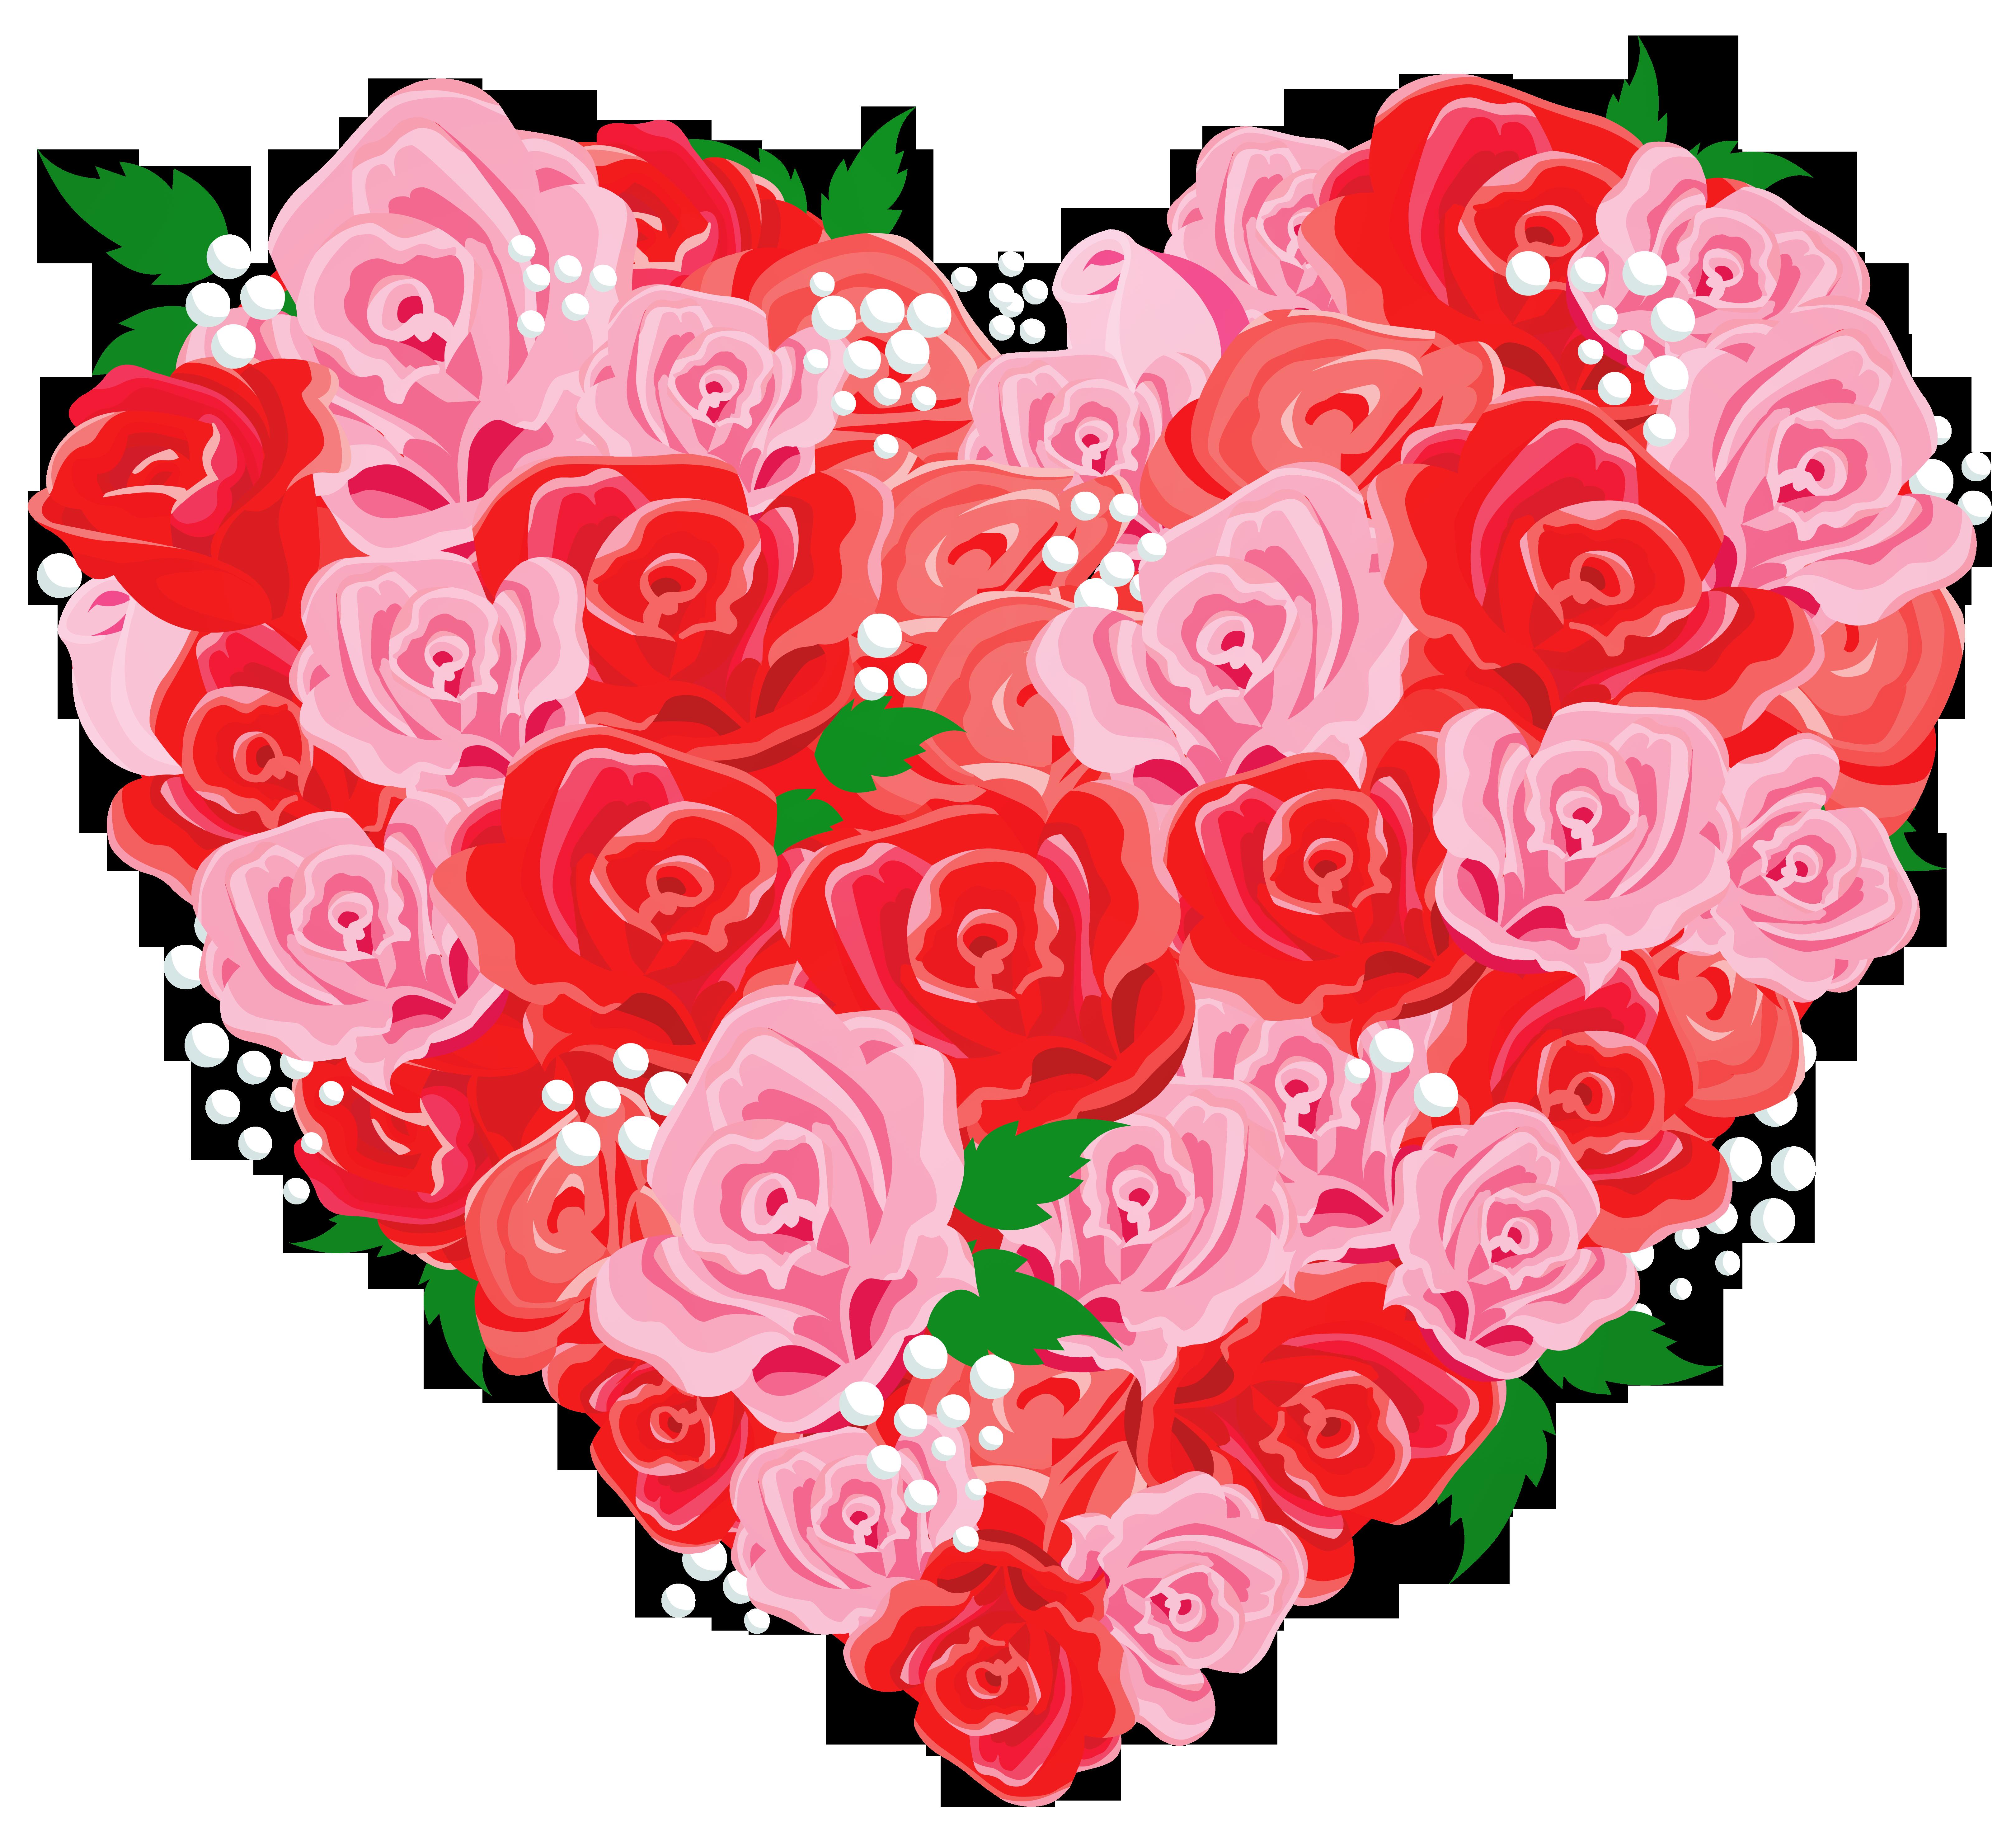 Deco rose heart png. Hearts clipart garden